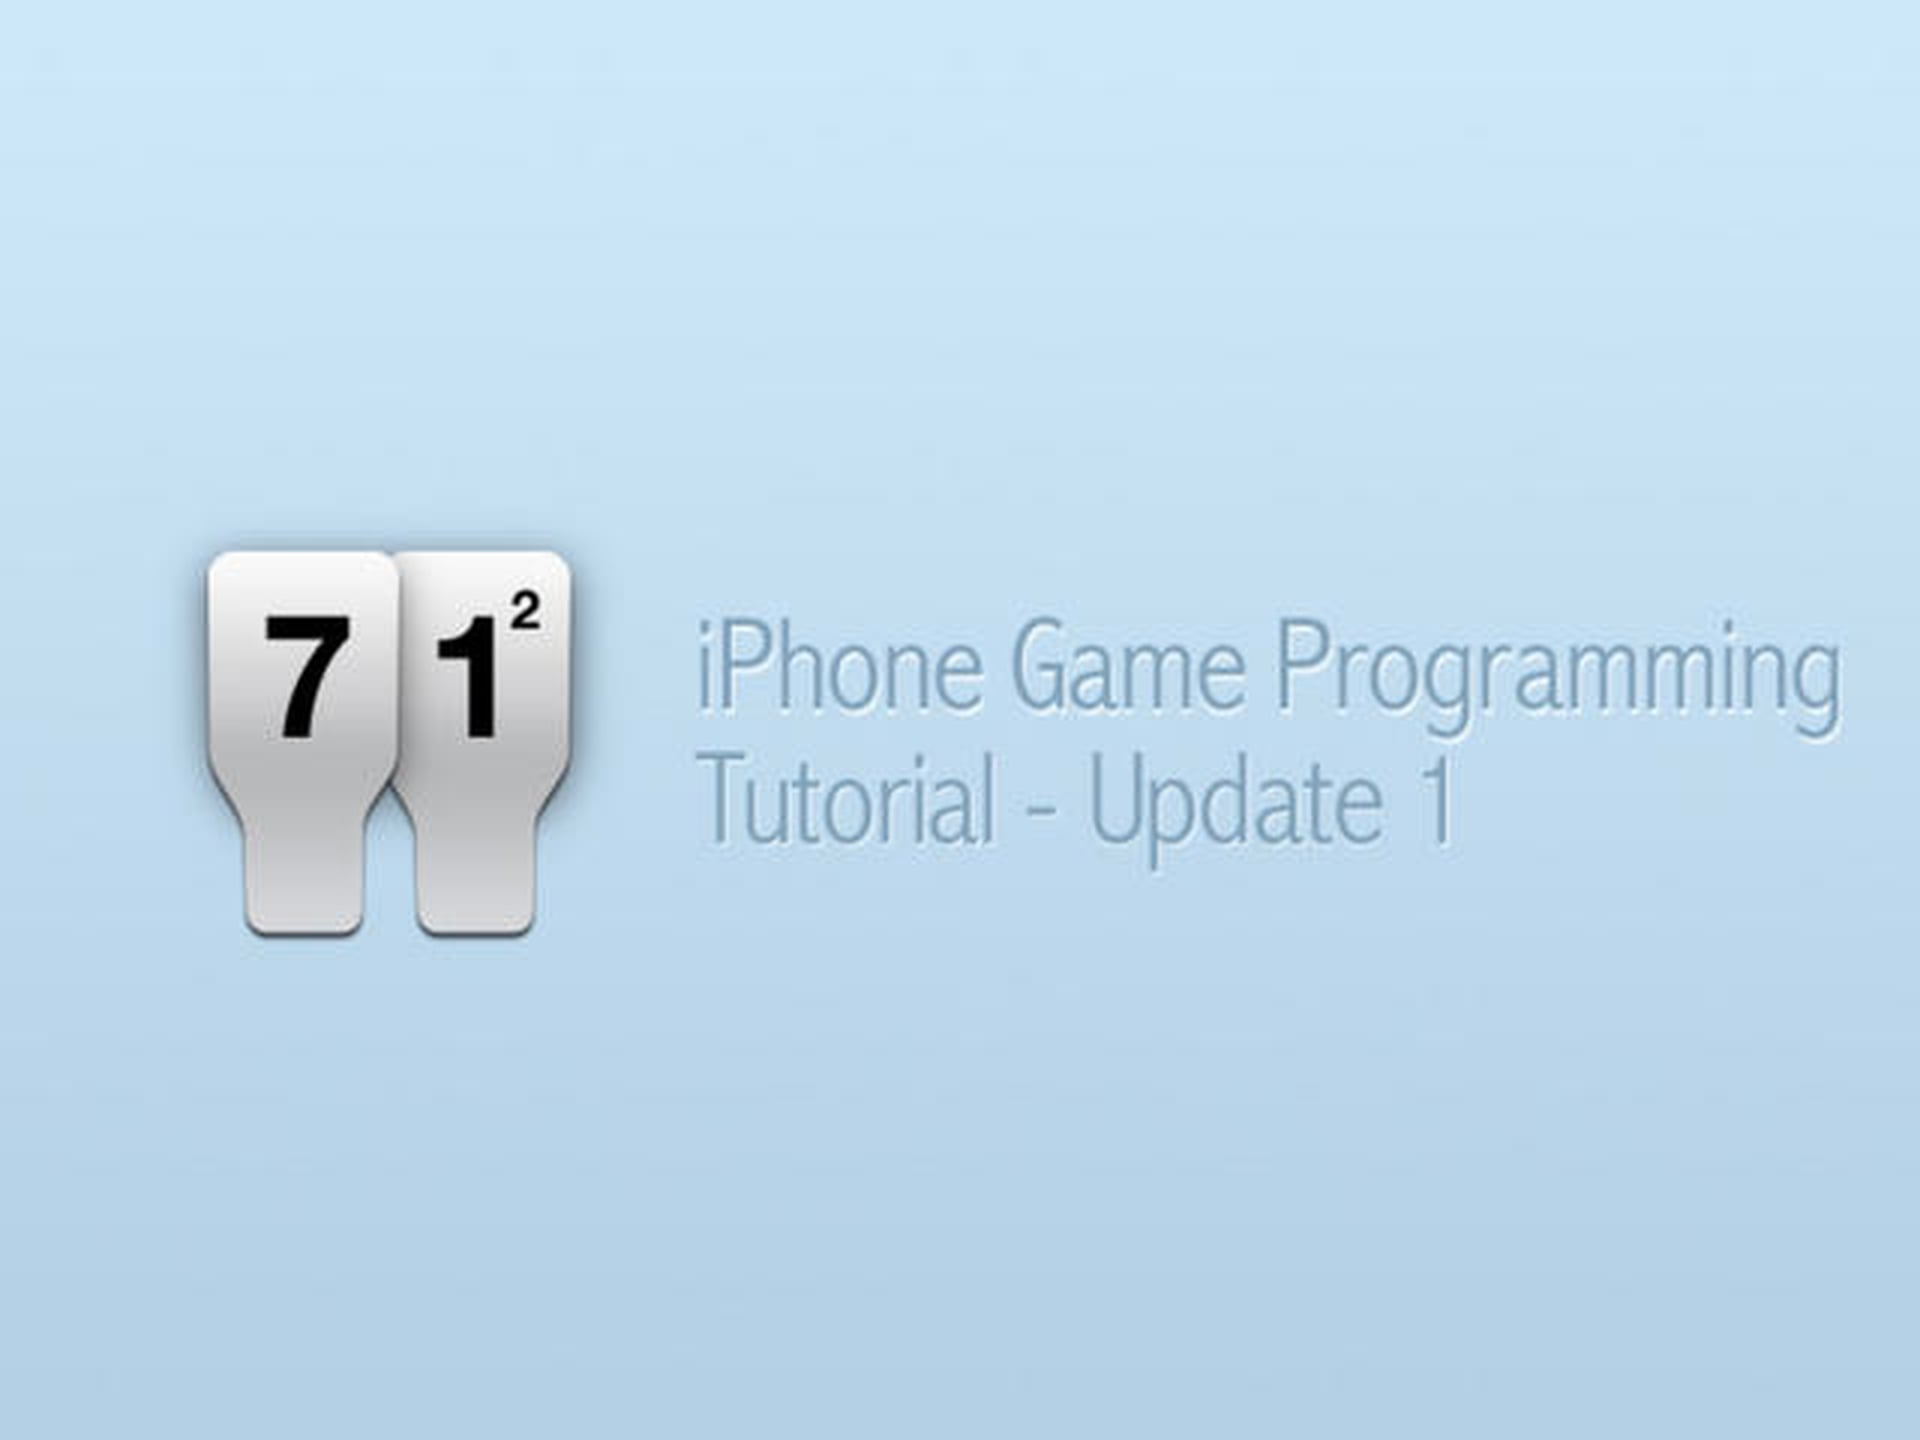 iPhone Game Programming – Tutorial Update 1